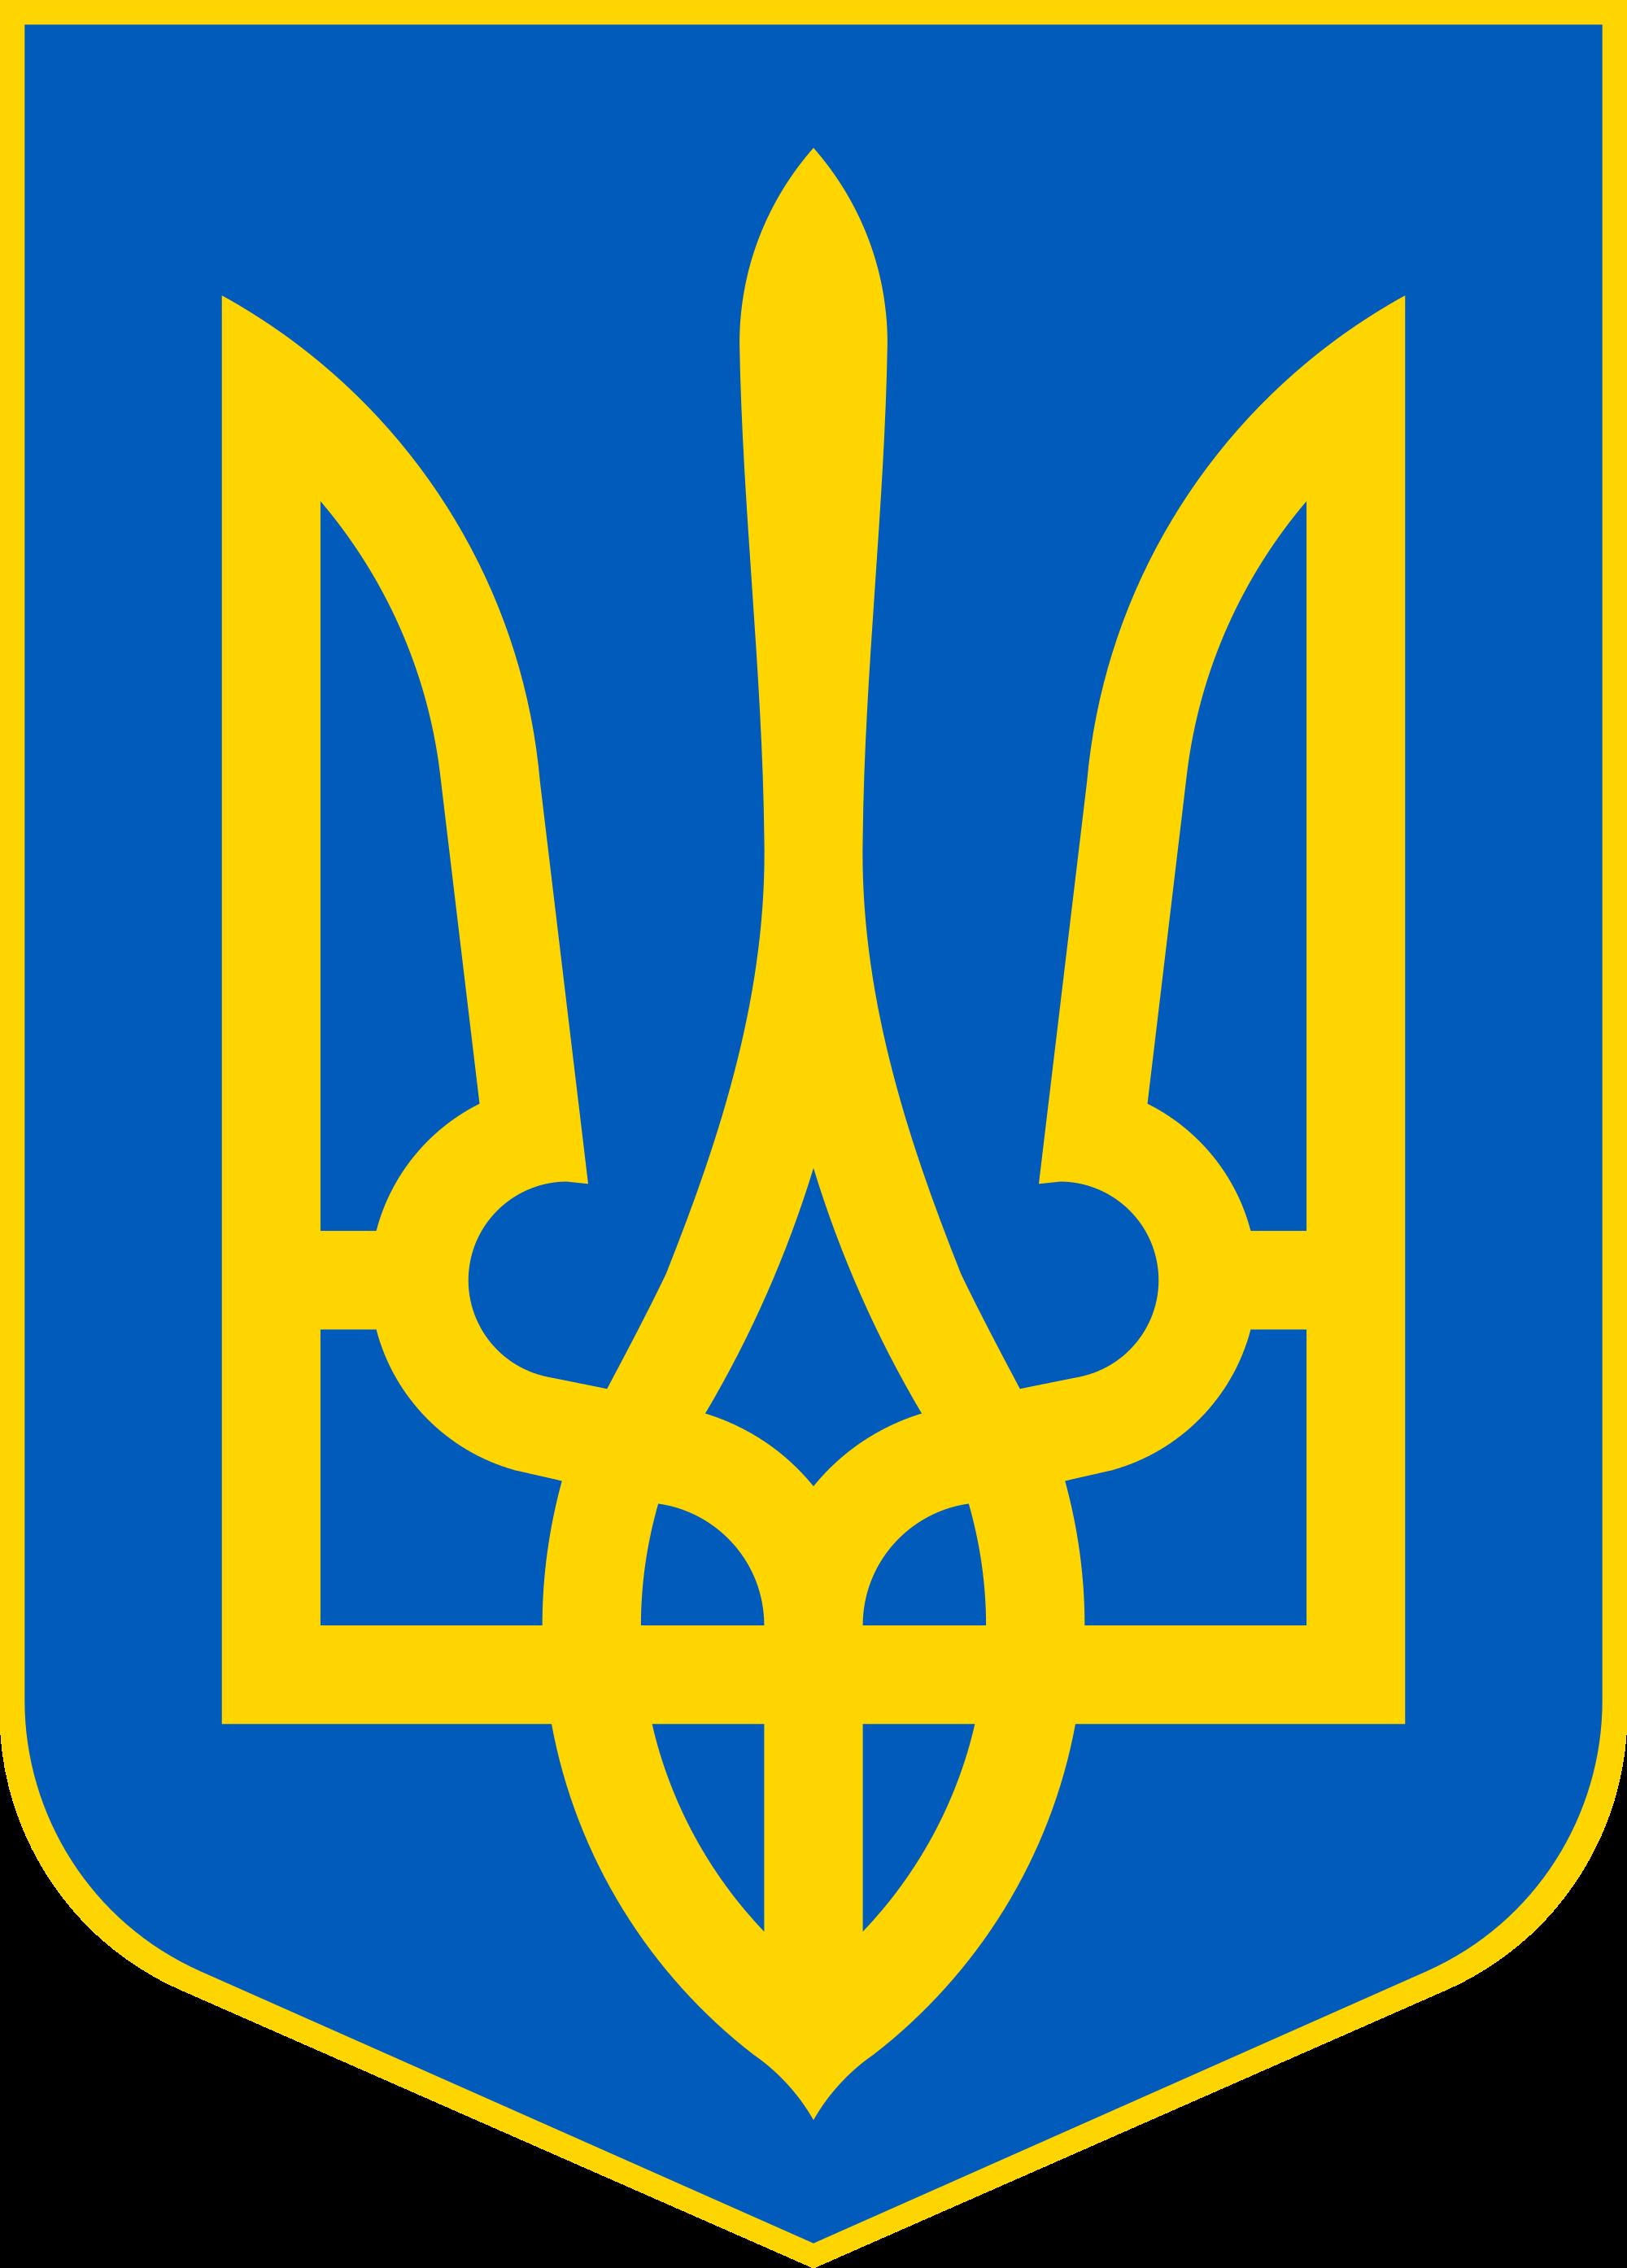 Ukraina euro 2016